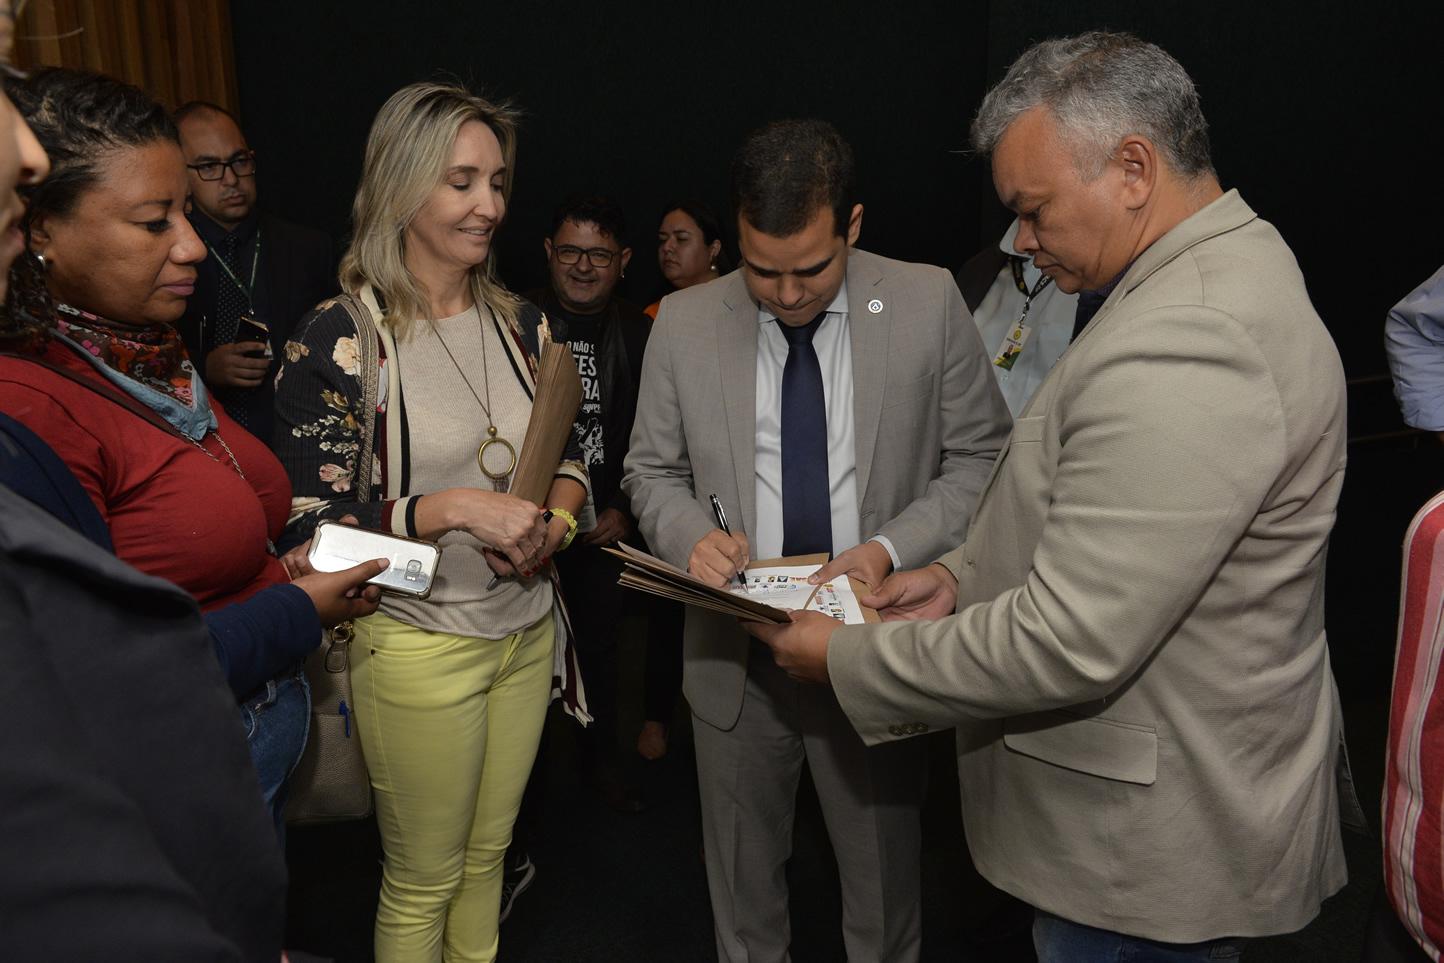 2019.06.13_Visita-aos-gabinetes-contra-o-fim-da-licenca-premio_fotos-Deva-Garcia-49